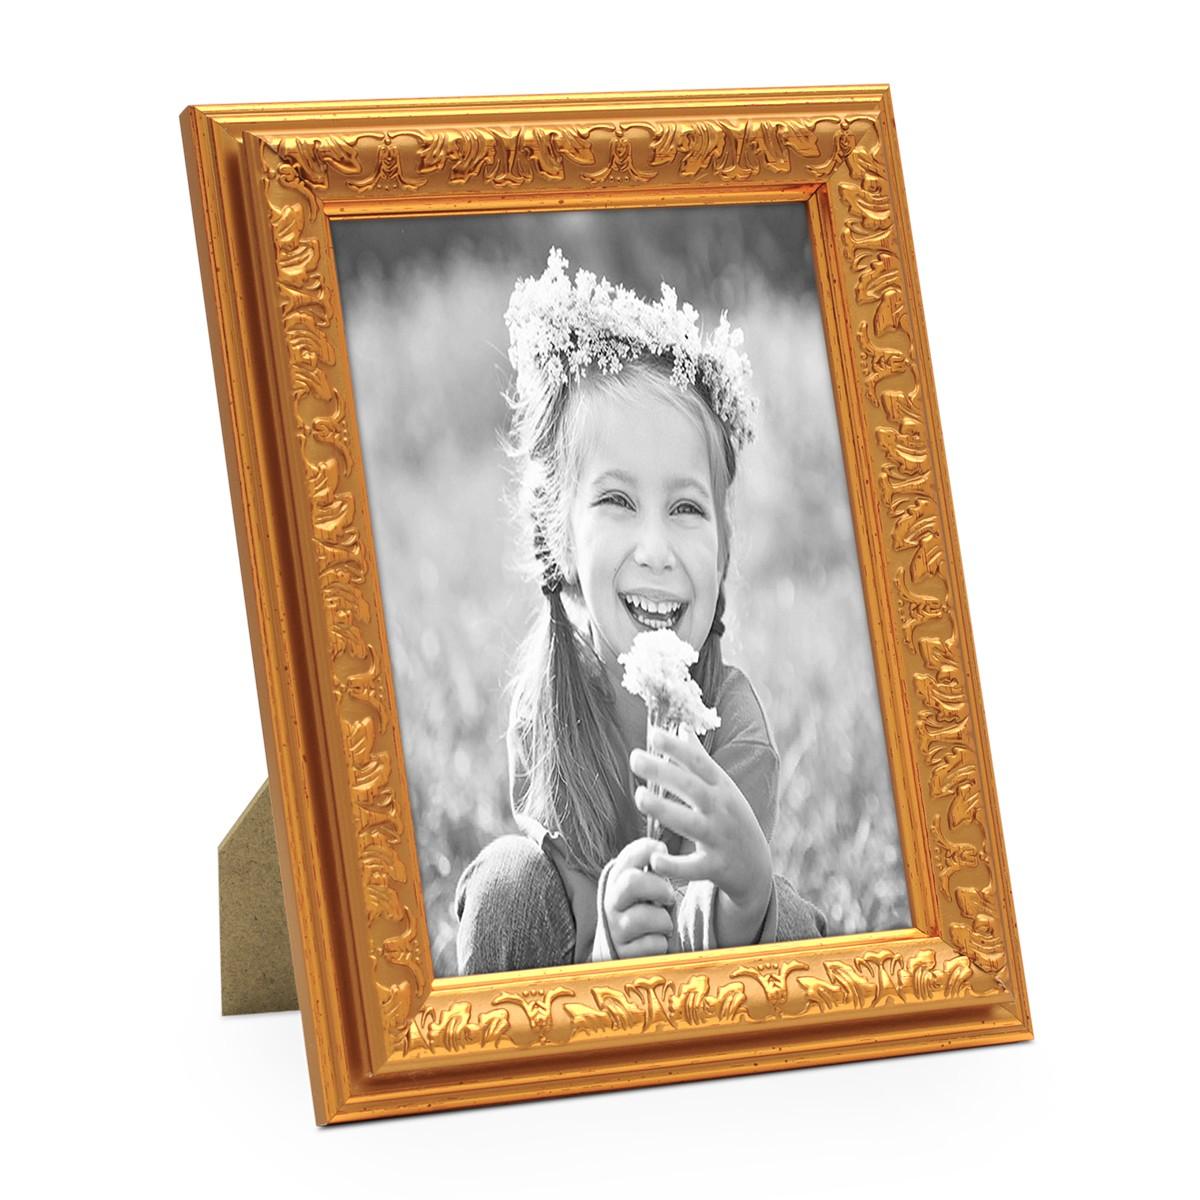 bilderrahmen antik gold nostalgie 10x15 cm fotorahmen mit glasscheibe kunststoff rahmen rahmen. Black Bedroom Furniture Sets. Home Design Ideas